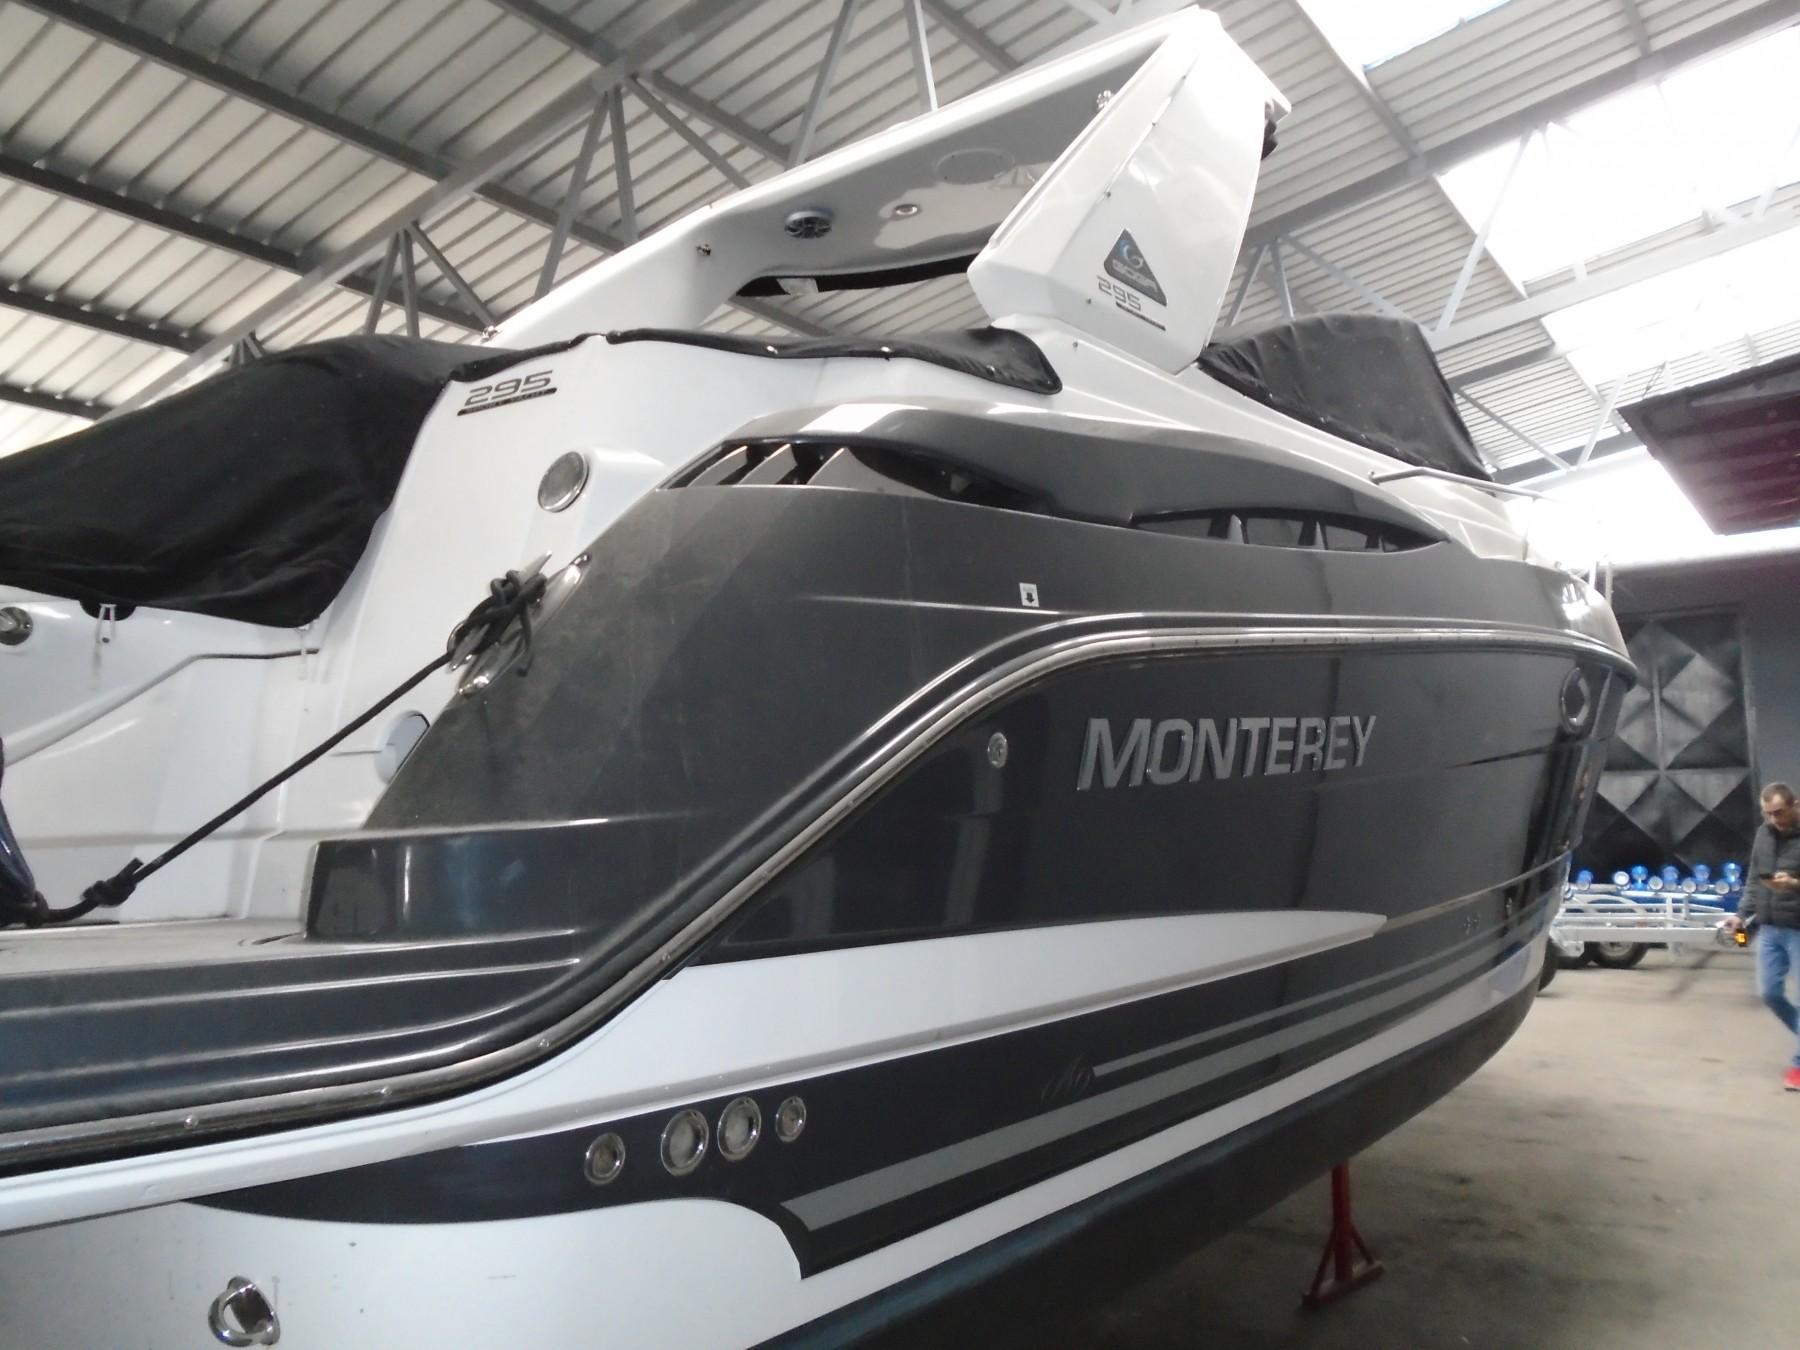 Mont 295sy - sivi 2018 (2)